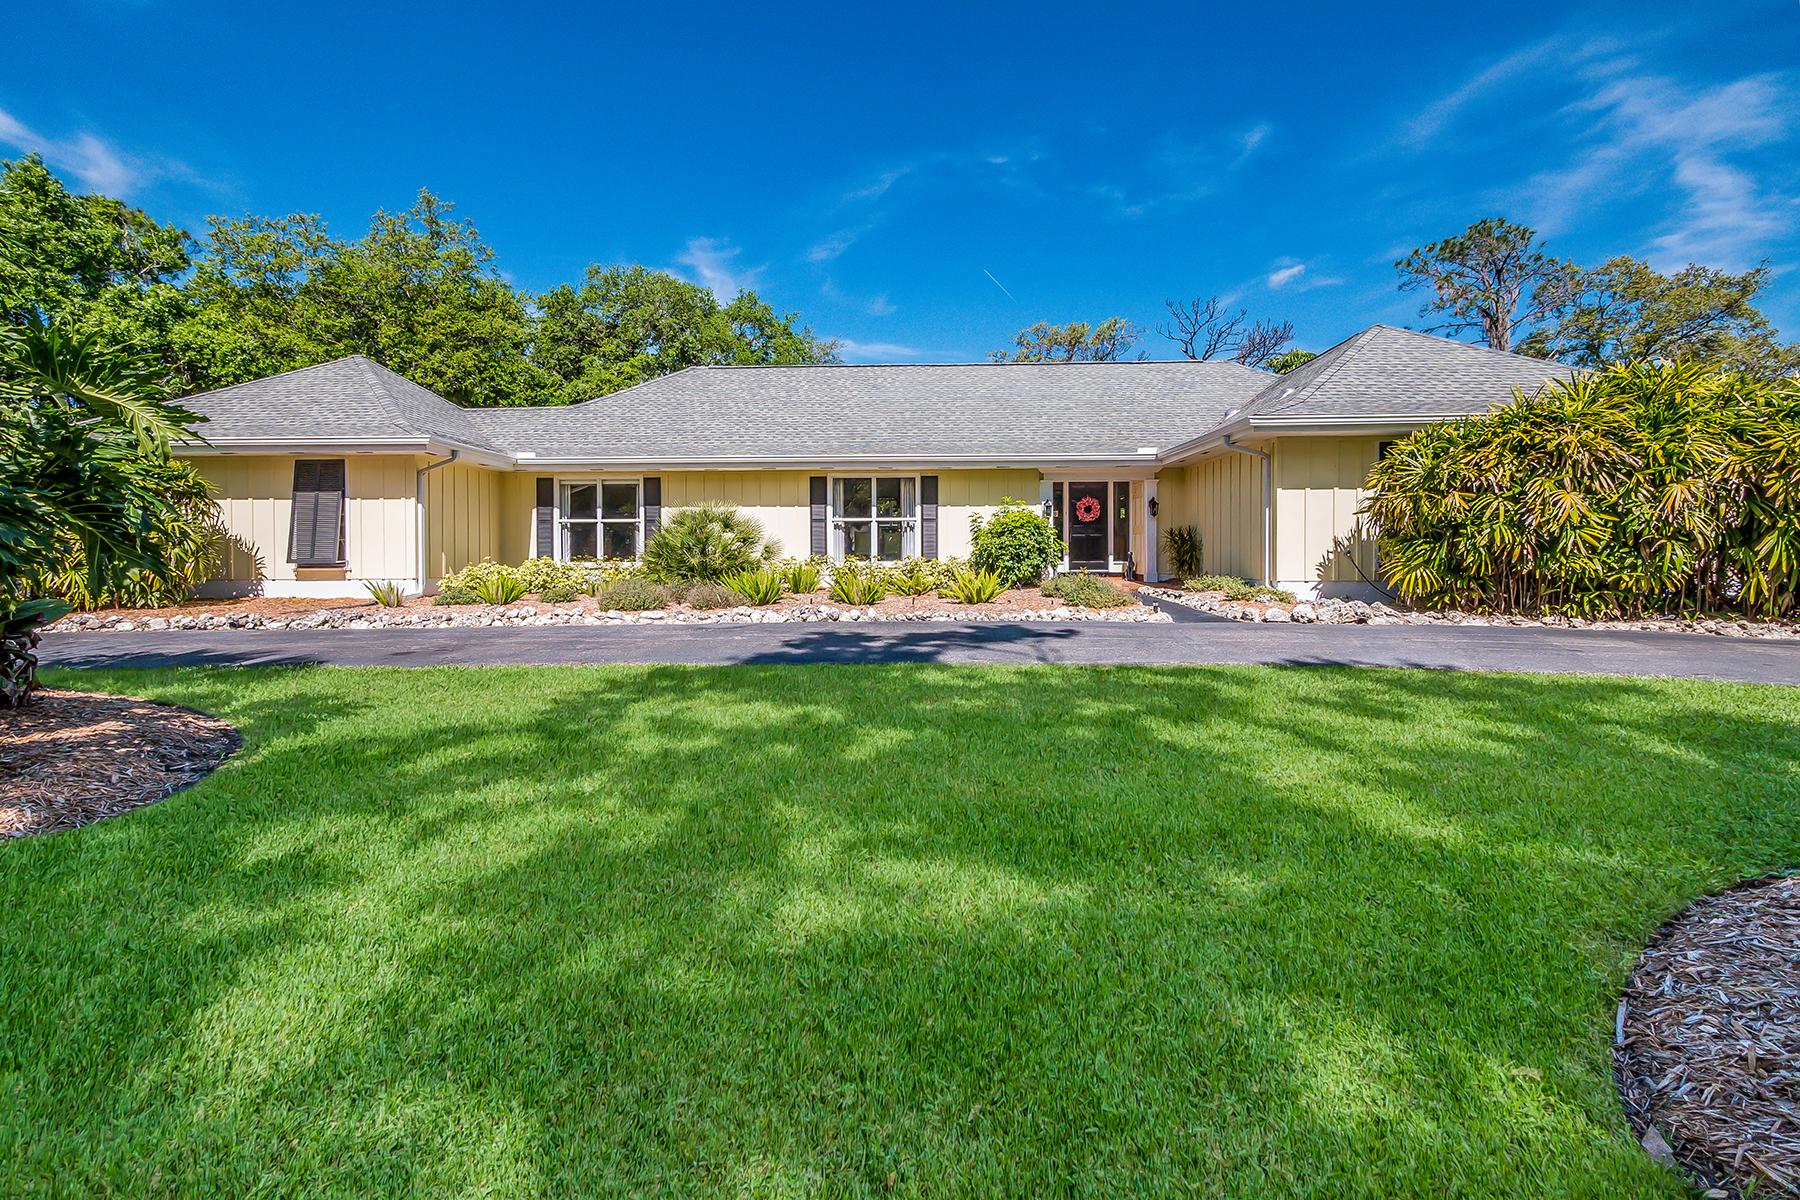 Single Family Home for Sale at FOXFIRE 7301 Quarter Horse Rd, Sarasota, Florida, 34241 United States